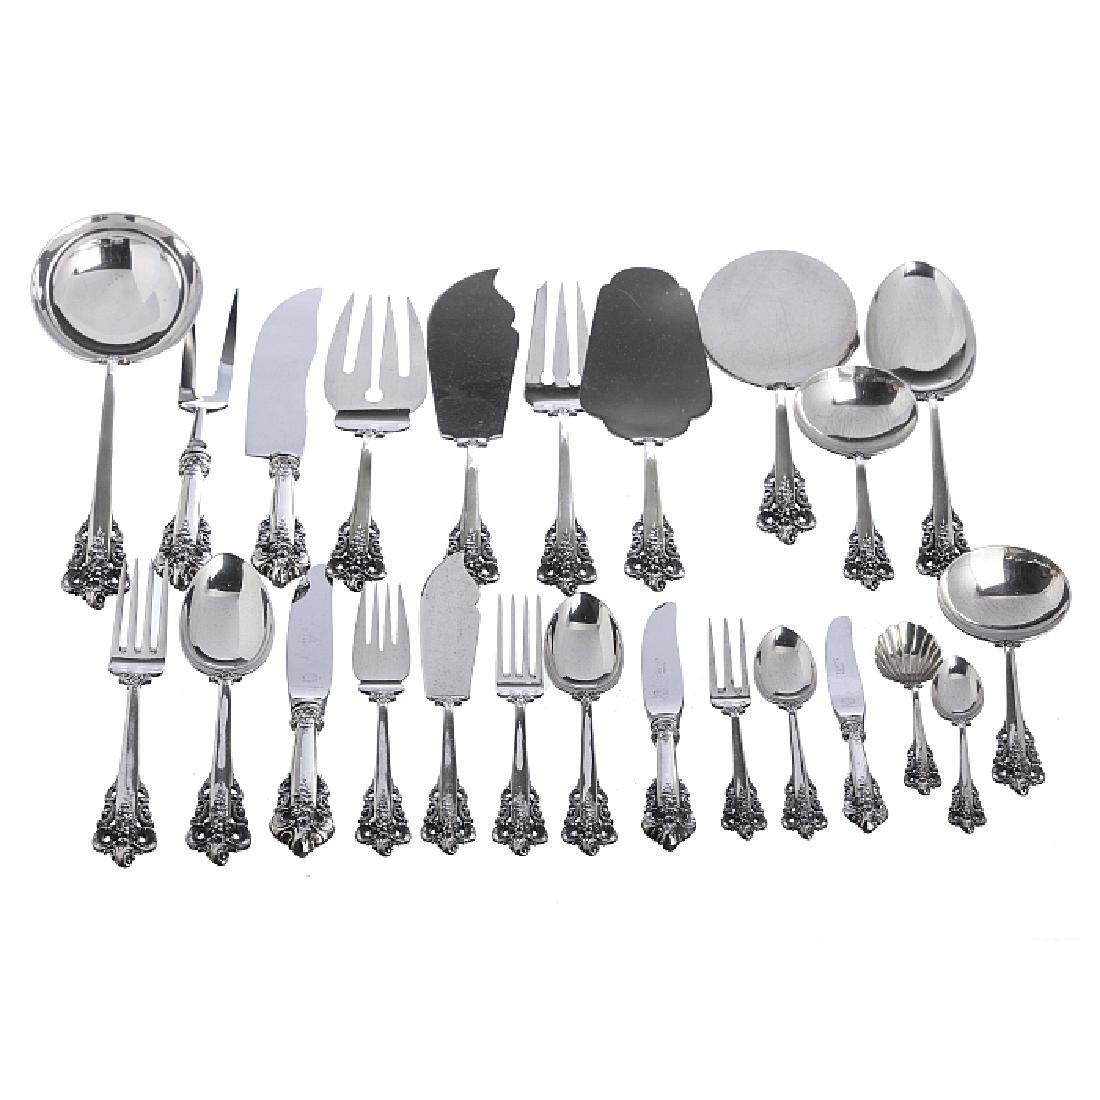 SUAREZ - Cutlery set in Spanish silver